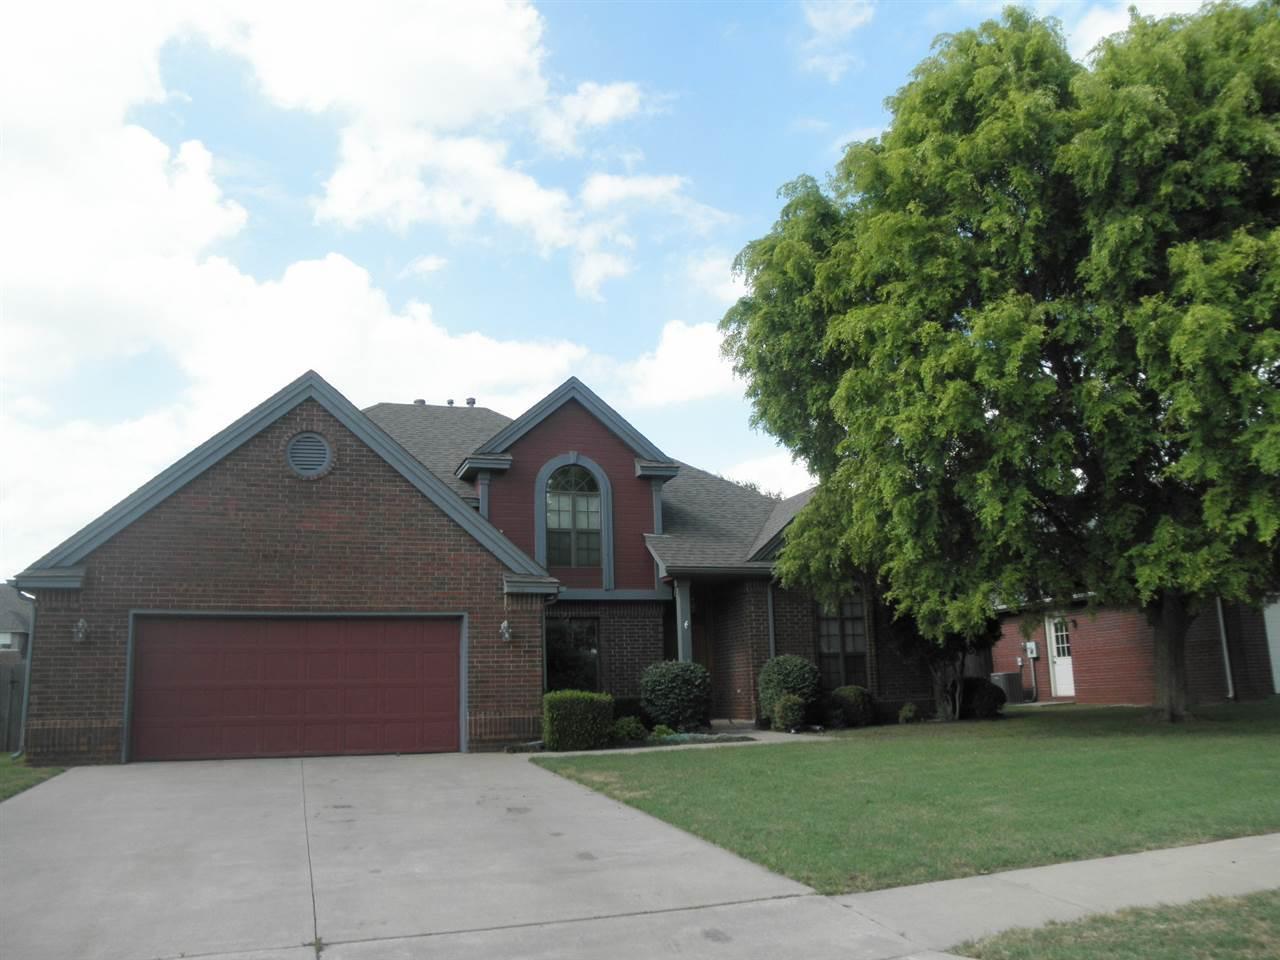 Sold Cross Sale W/ MLS | 2105 Huntington Ponca City, OK 74604 0